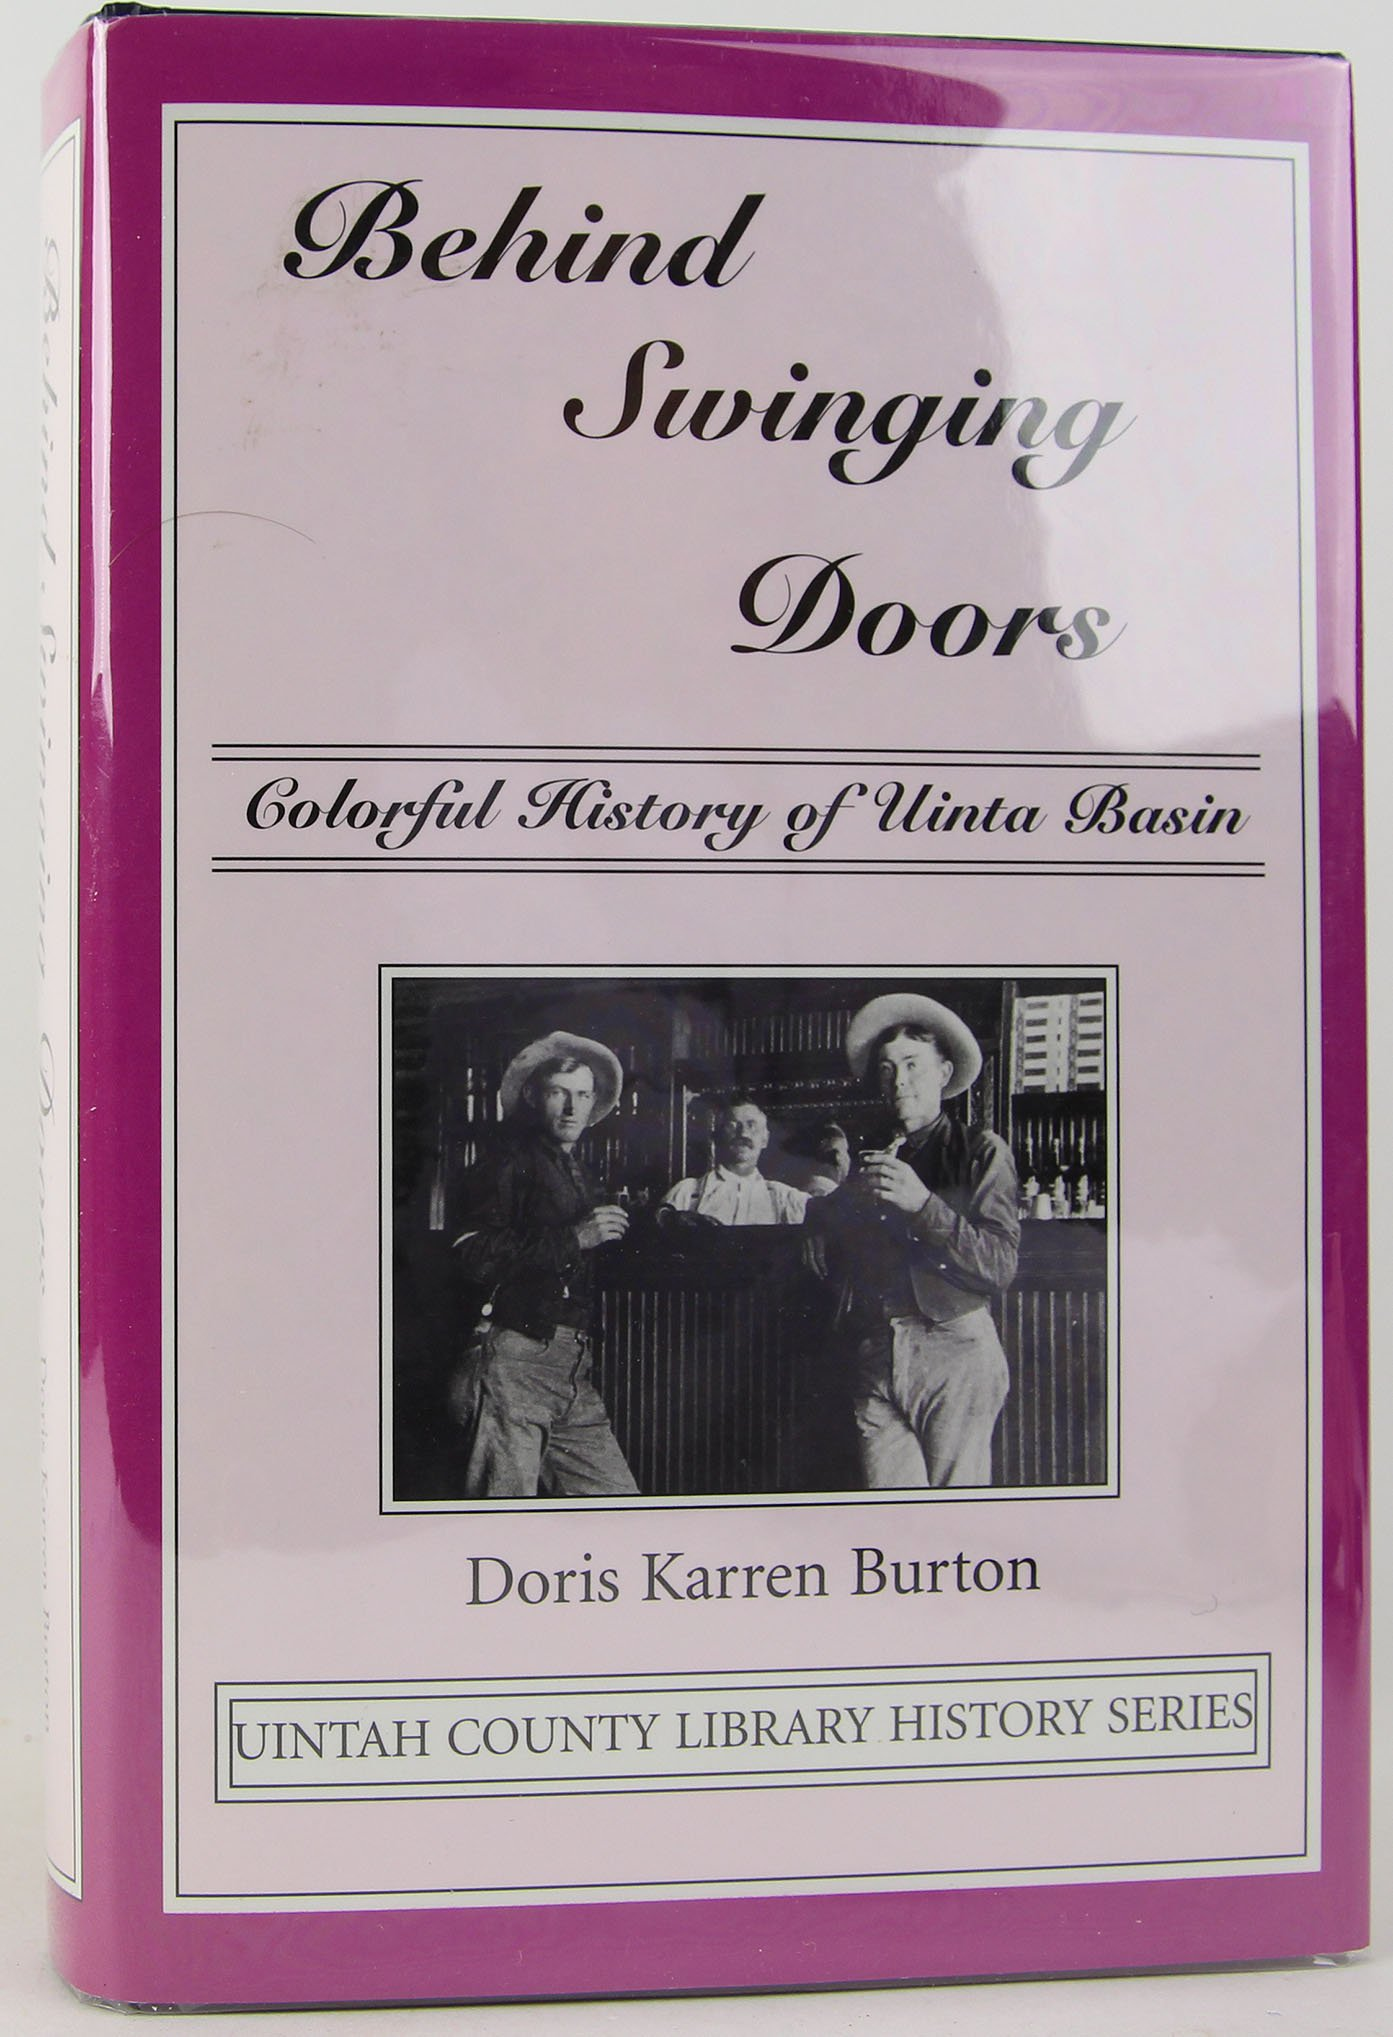 Behind swinging doors: Colorful history of Uinta Basin (Uintah County Library history series)